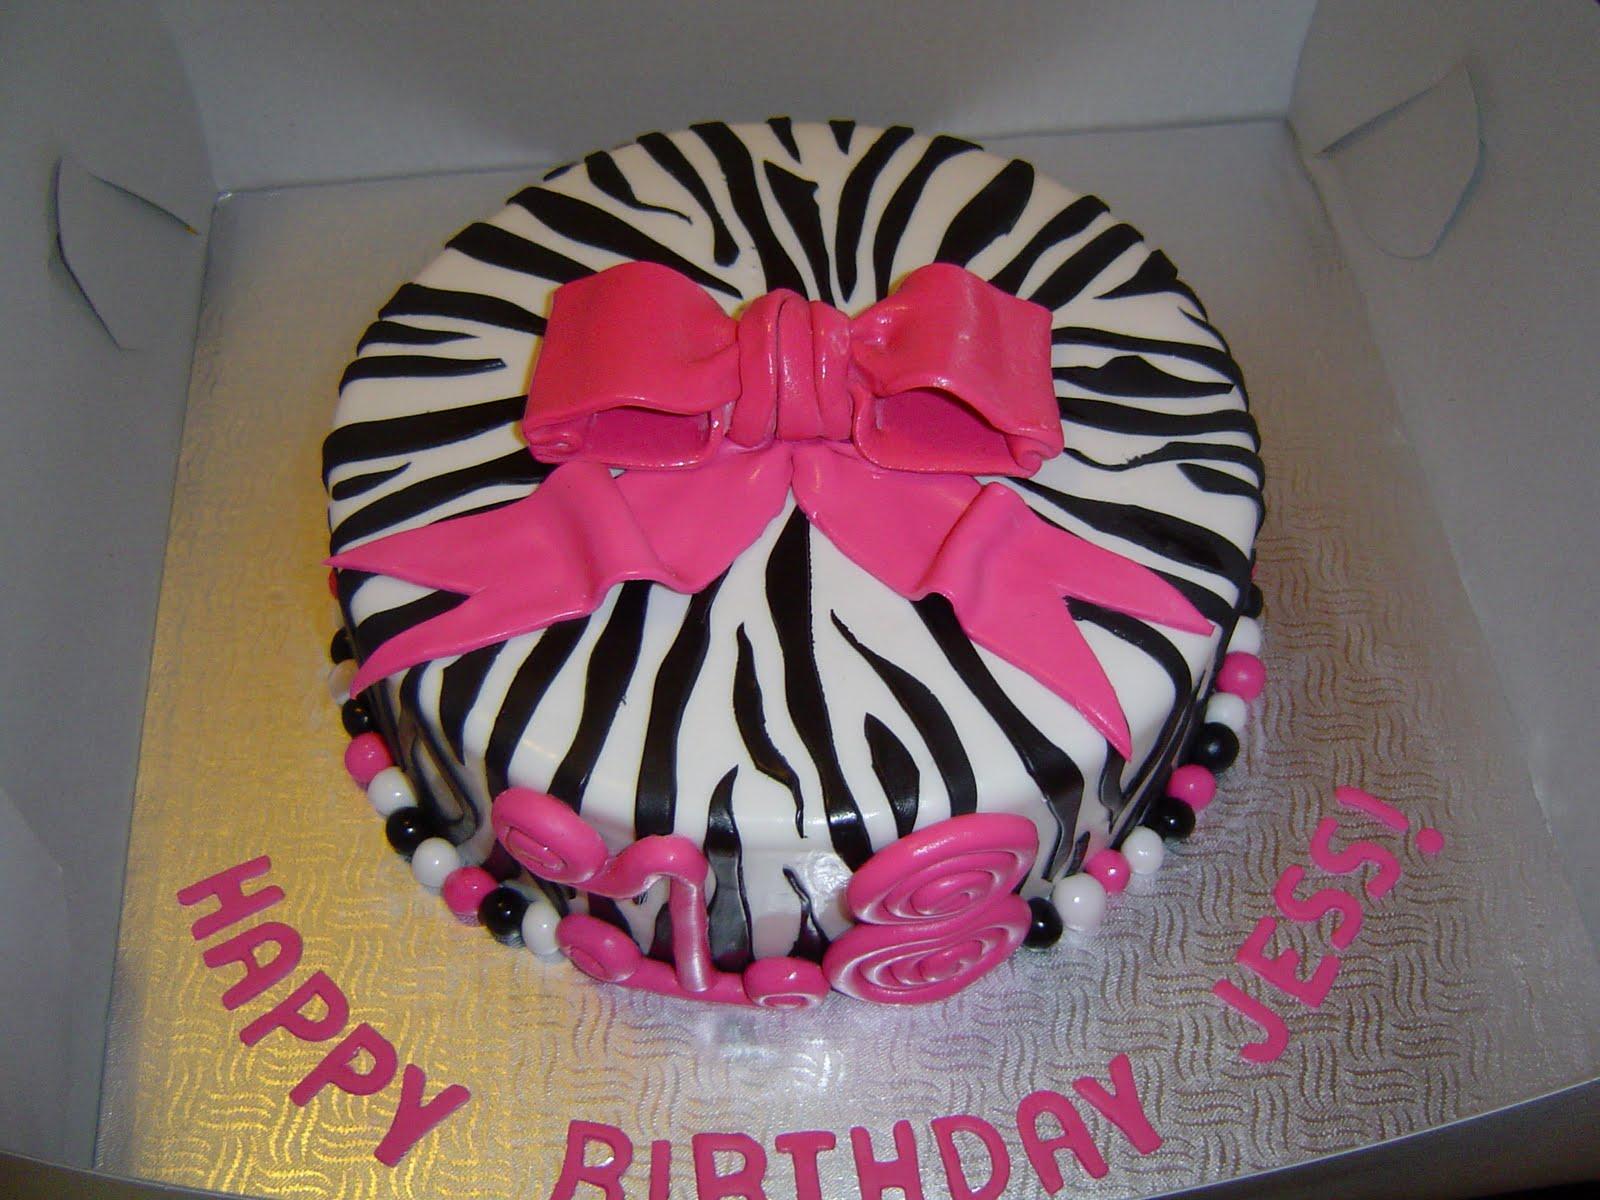 Enjoyable 18 19 20 21 22 Birthday Girl Cakes Cupcakes Mumbai 11 Cakes And Personalised Birthday Cards Veneteletsinfo